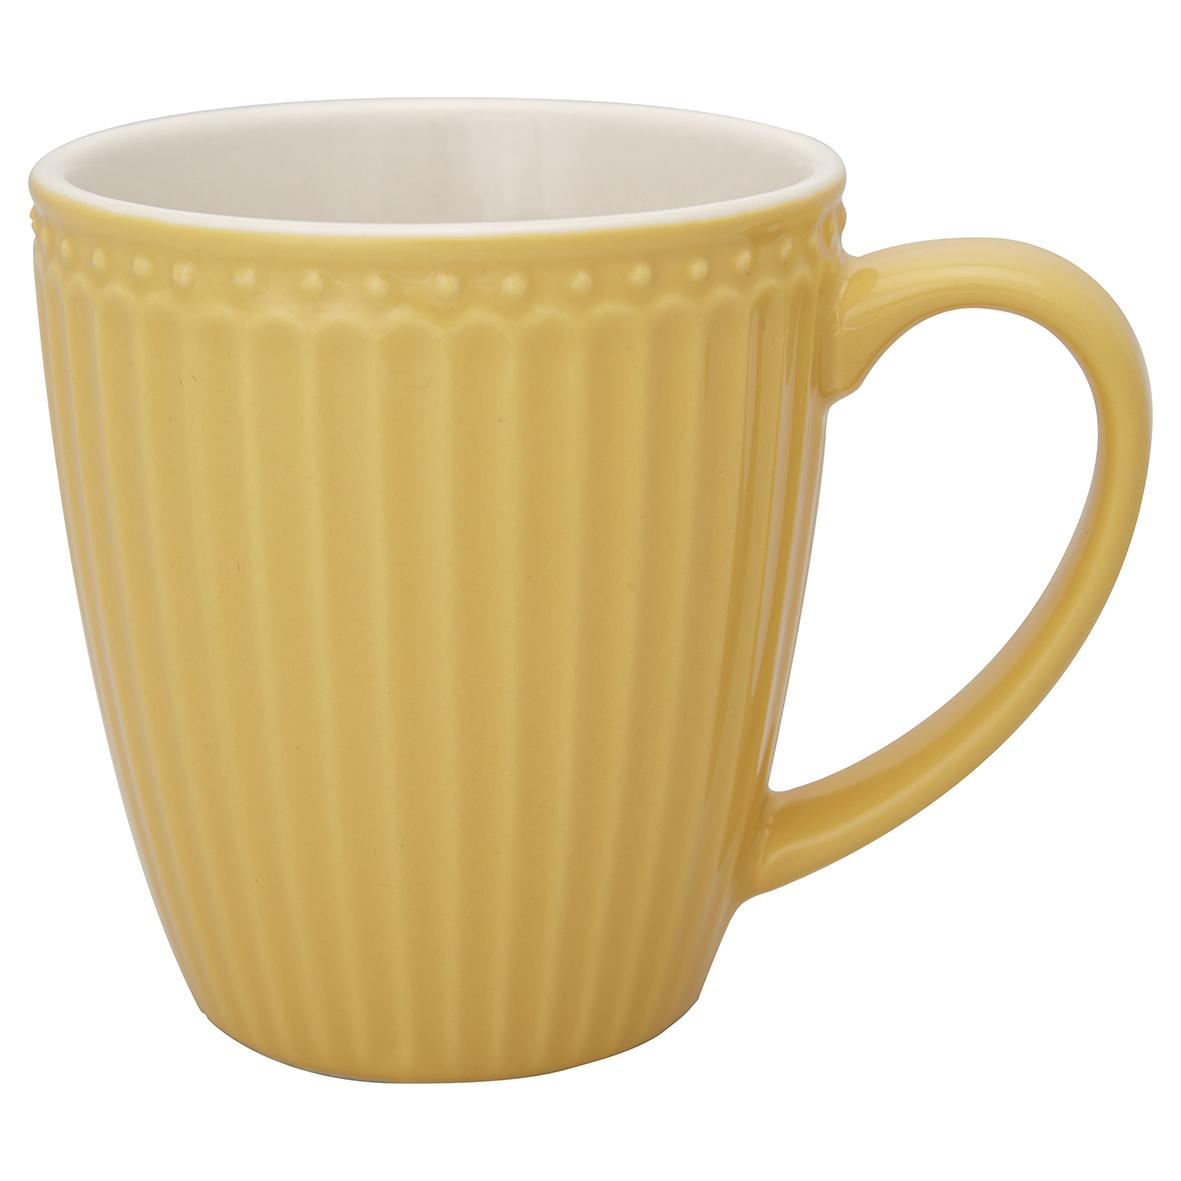 Greengate Becher Alice honey mustard Everyday Kollektion